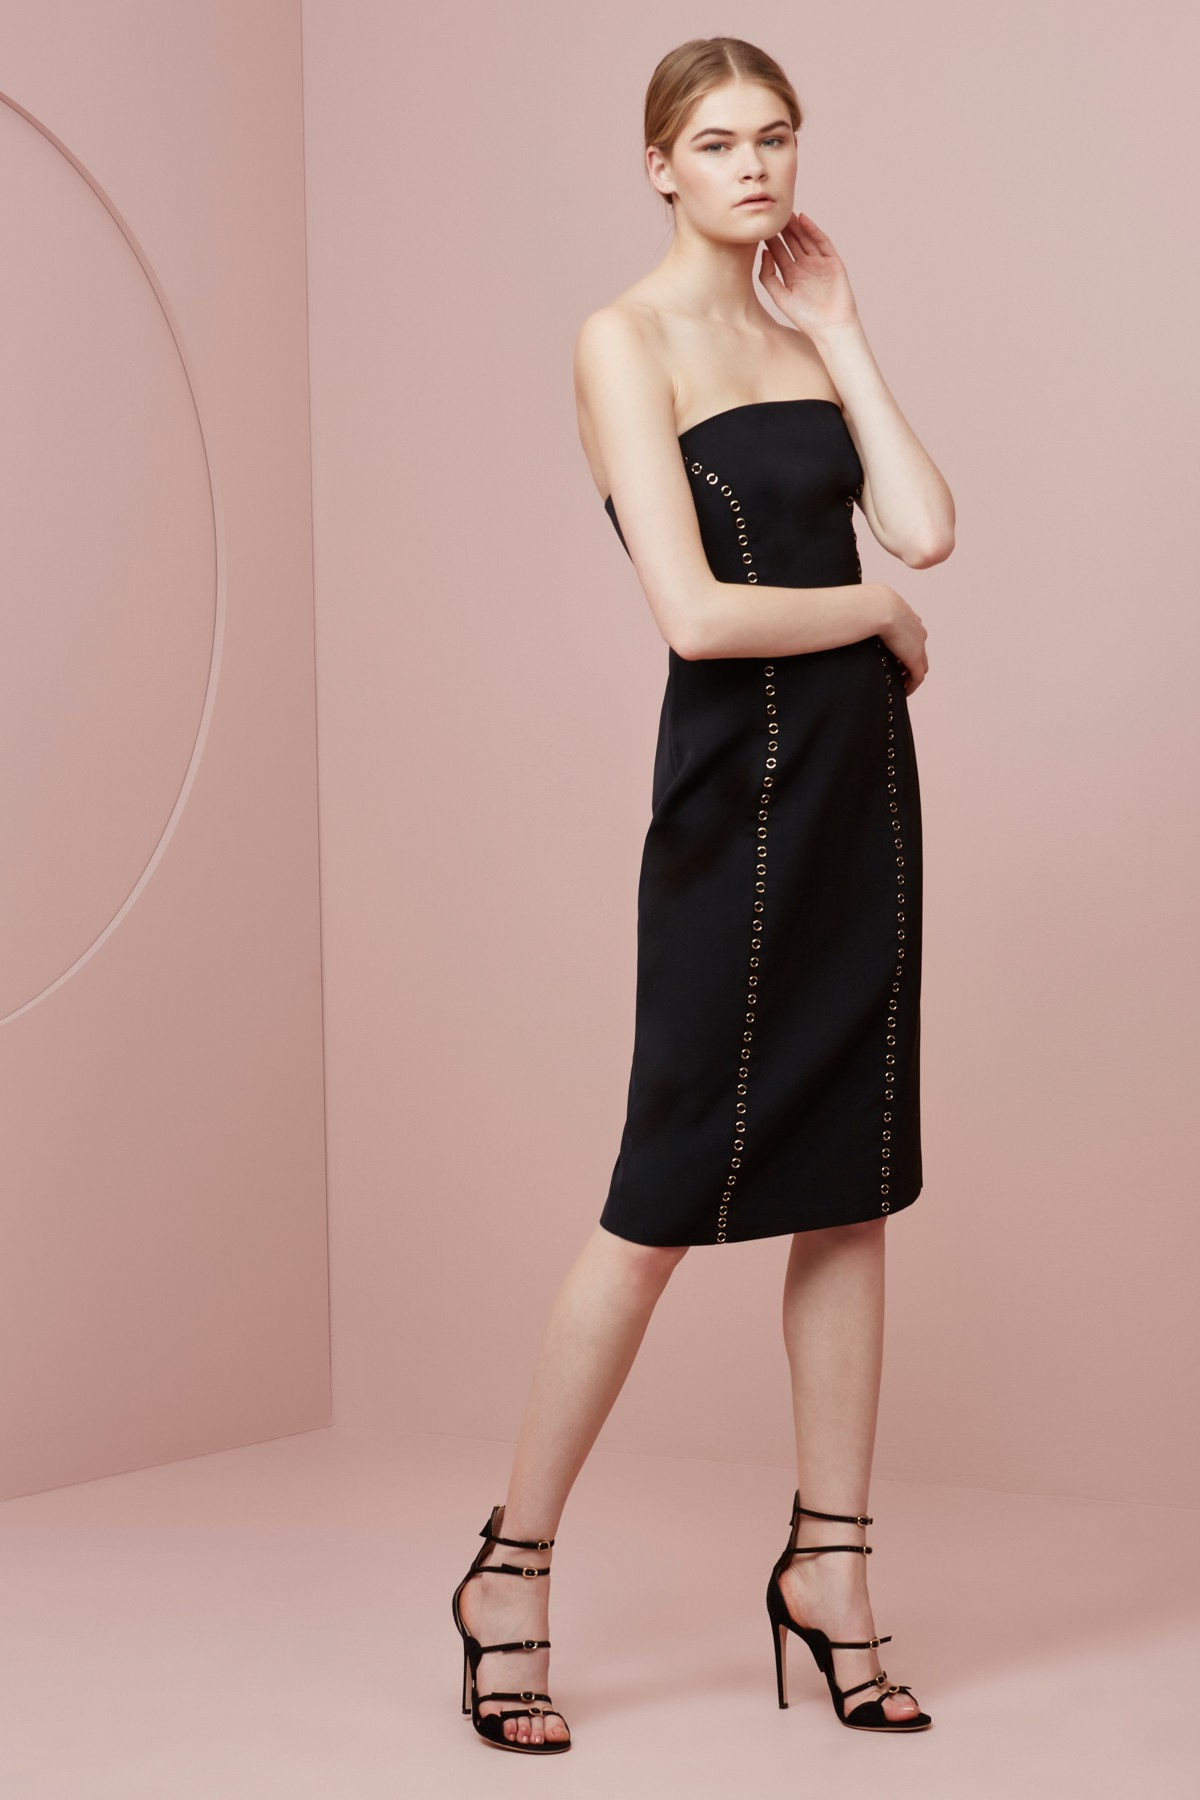 Shop Keepsake In Your Eyes Midi Dress.